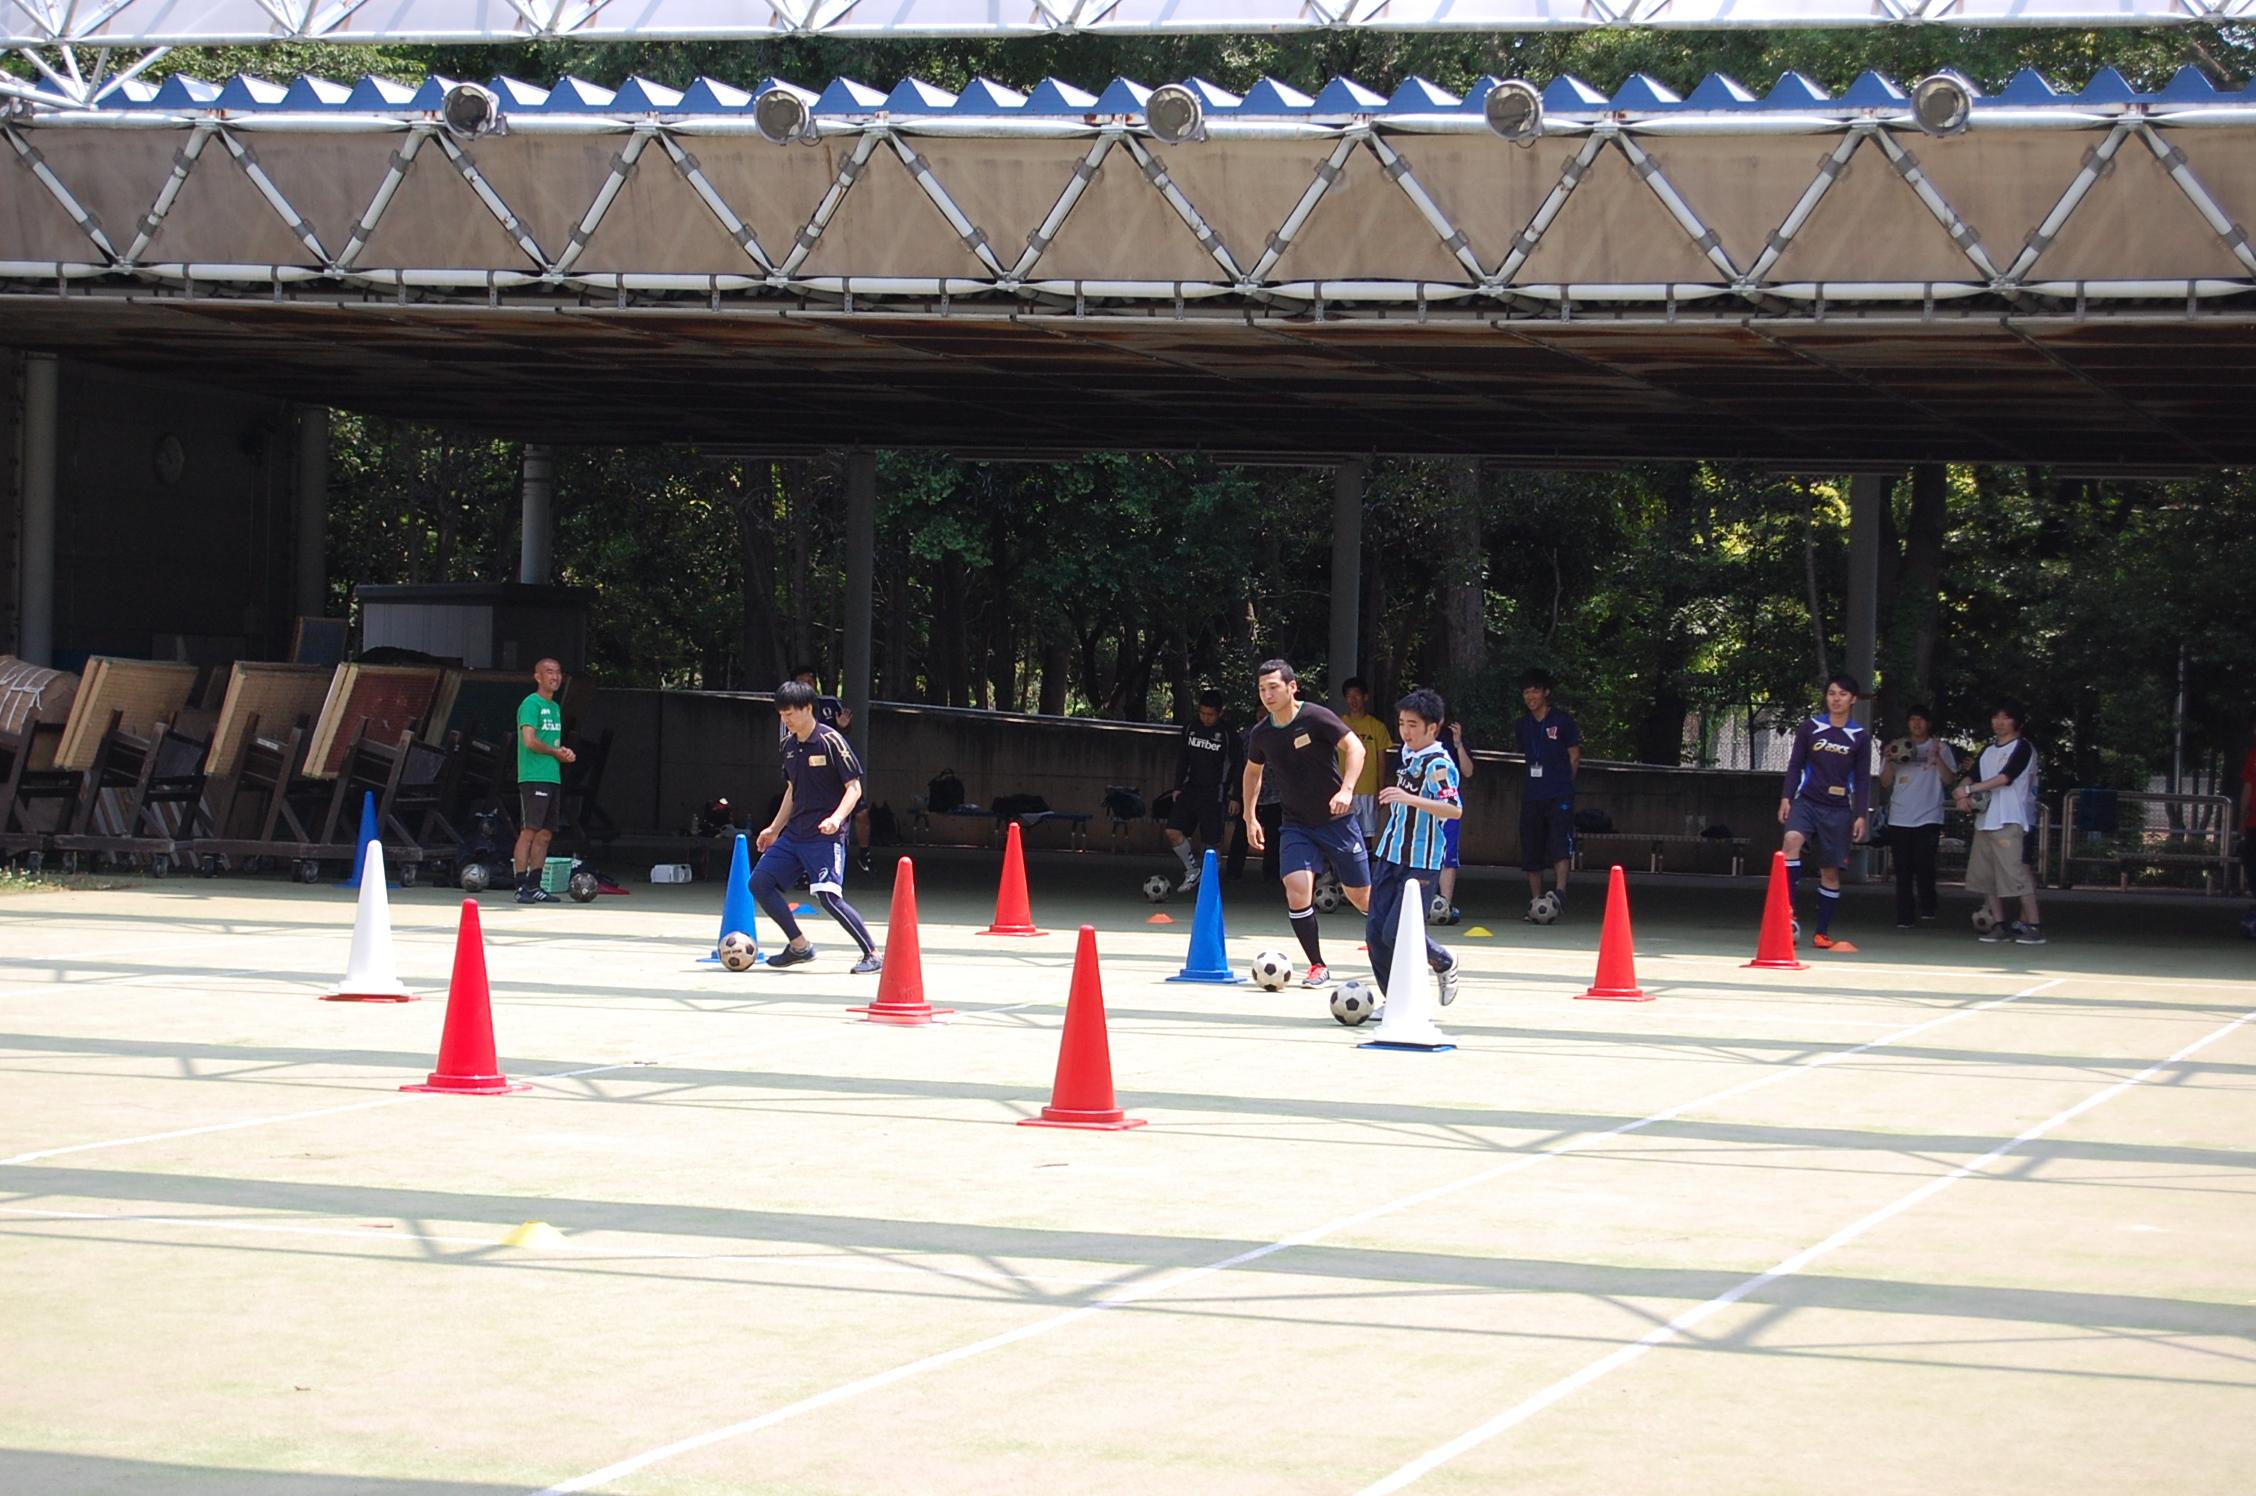 DSC 0009 - 「めざせ!サッカー大会」教室